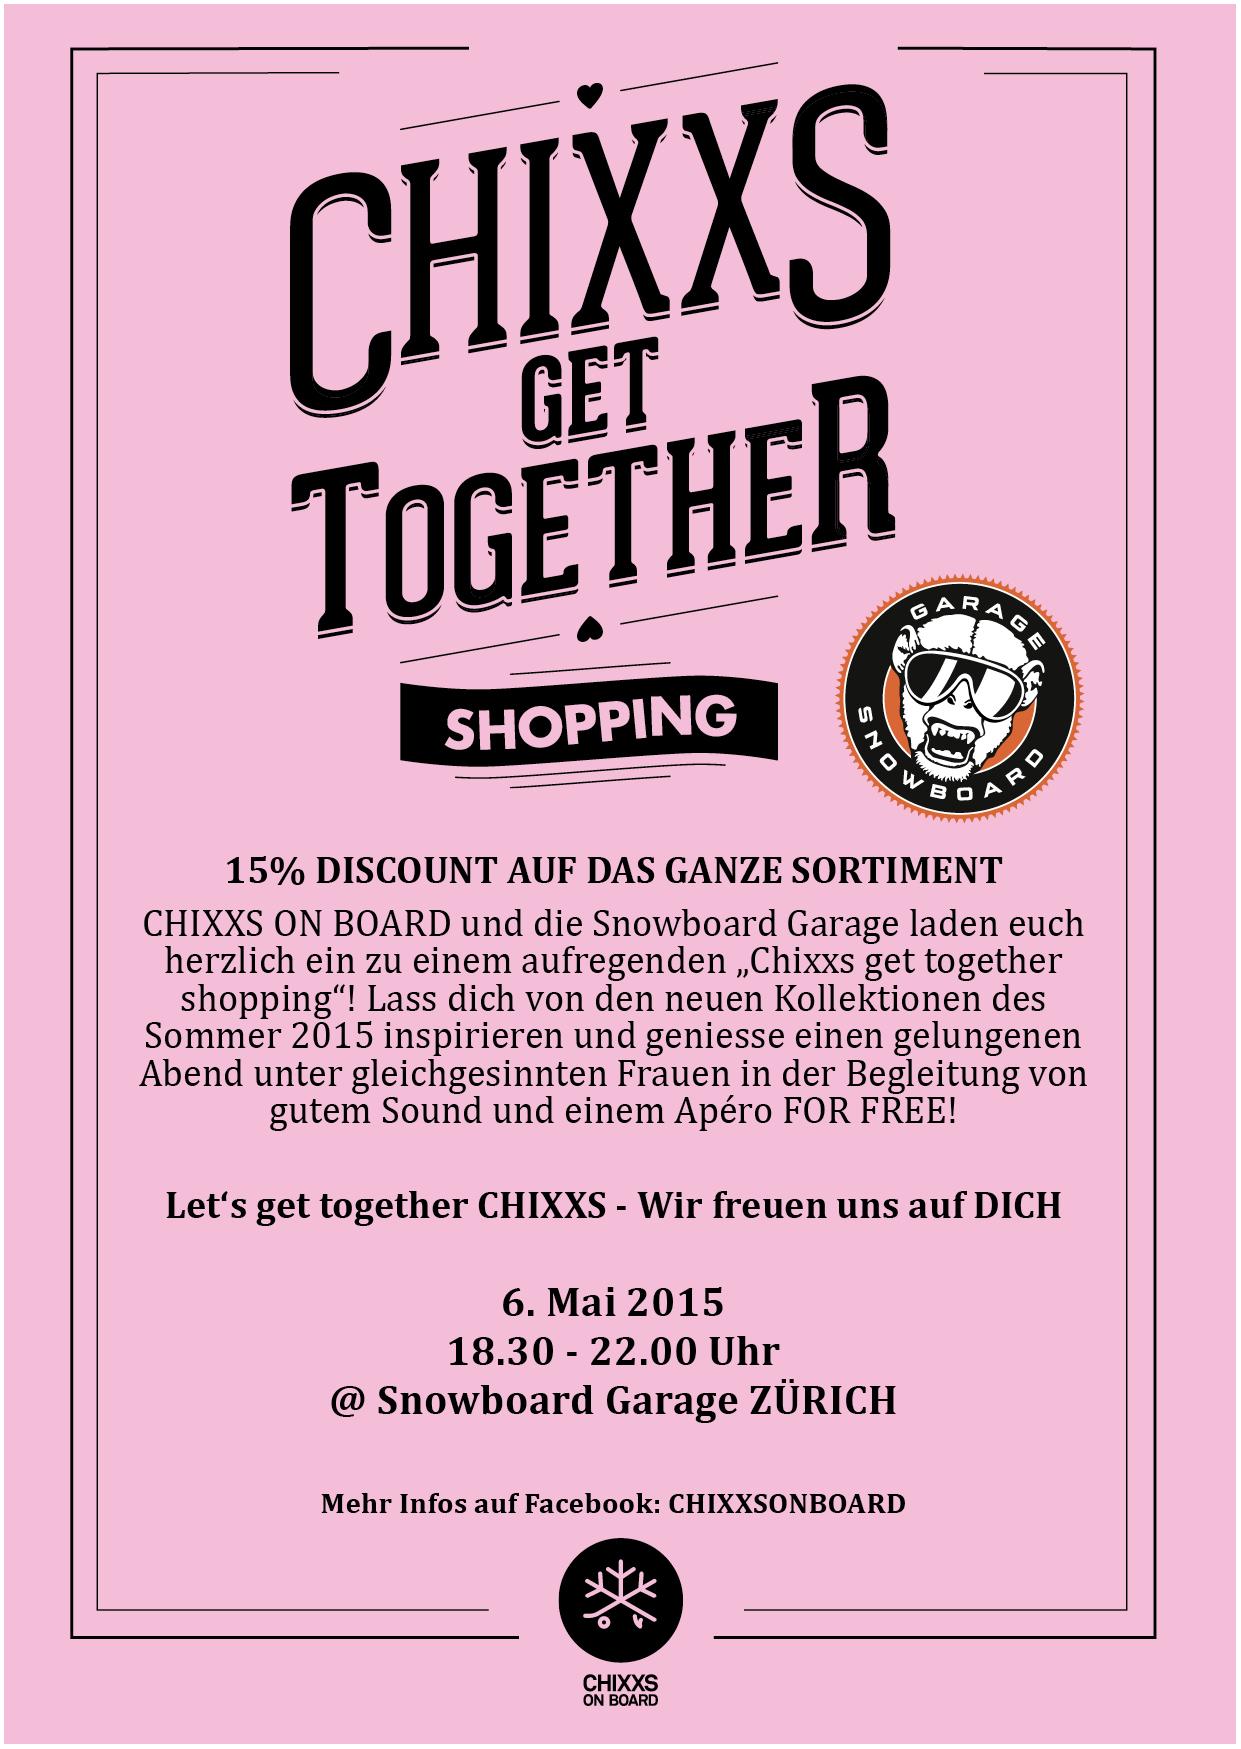 chixxs_shopping_2015